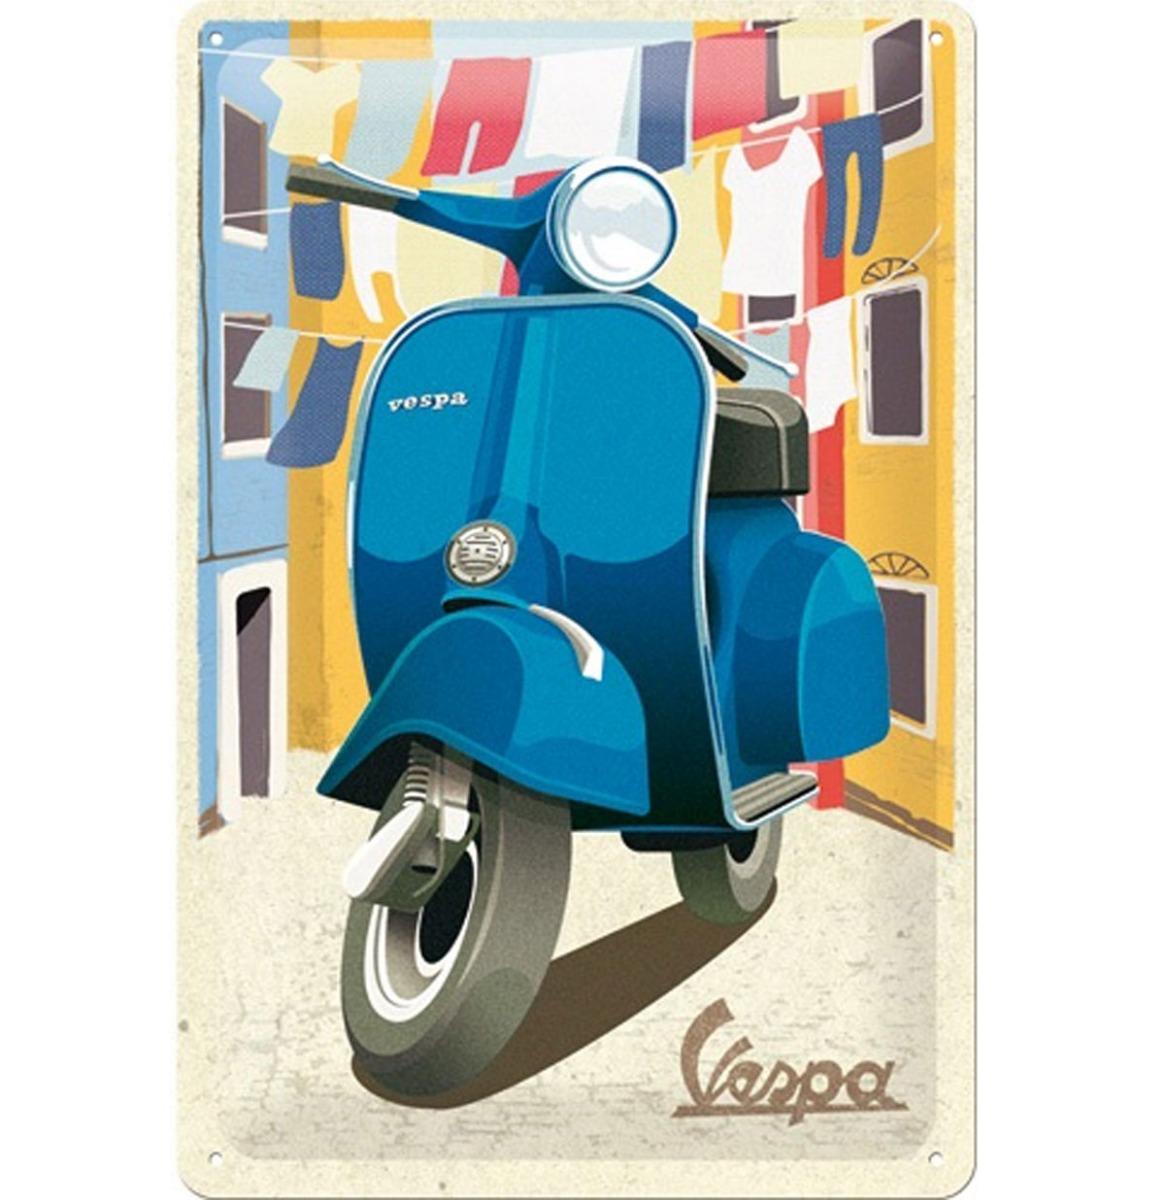 Vespa Italian Laundry Metalen Bord - 20 x 30 cm